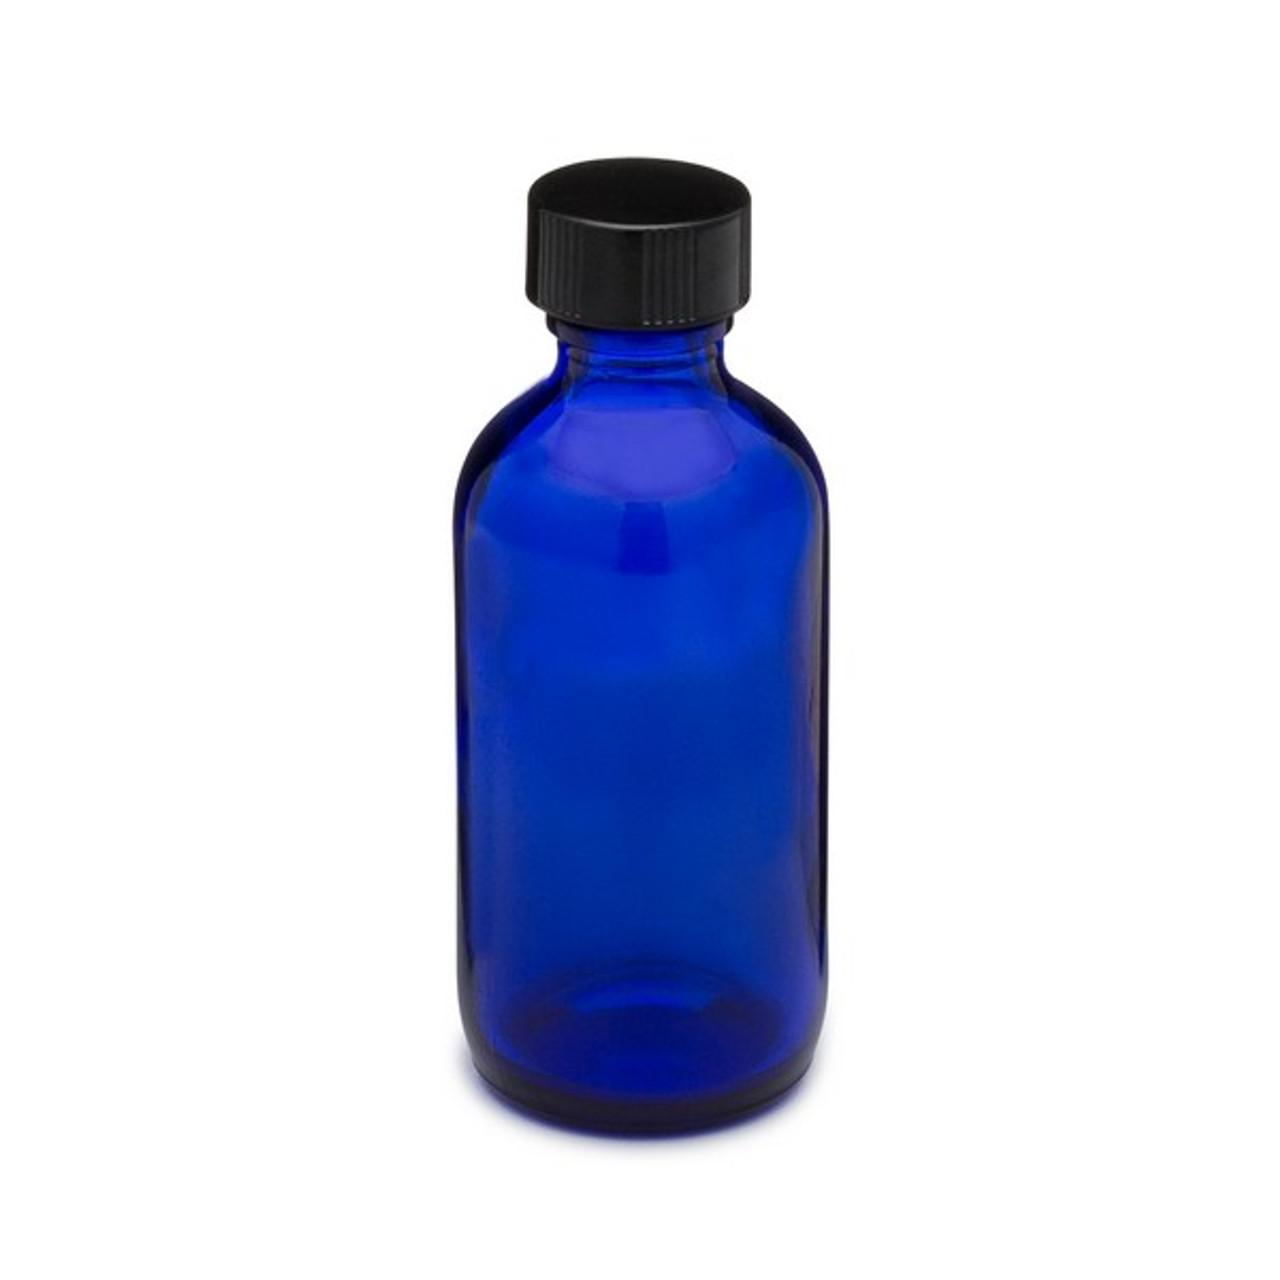 fa268e713bba 2 oz Cobalt Blue Glass Boston Round Bottles (Black Phenolic Cap) - 4999B05